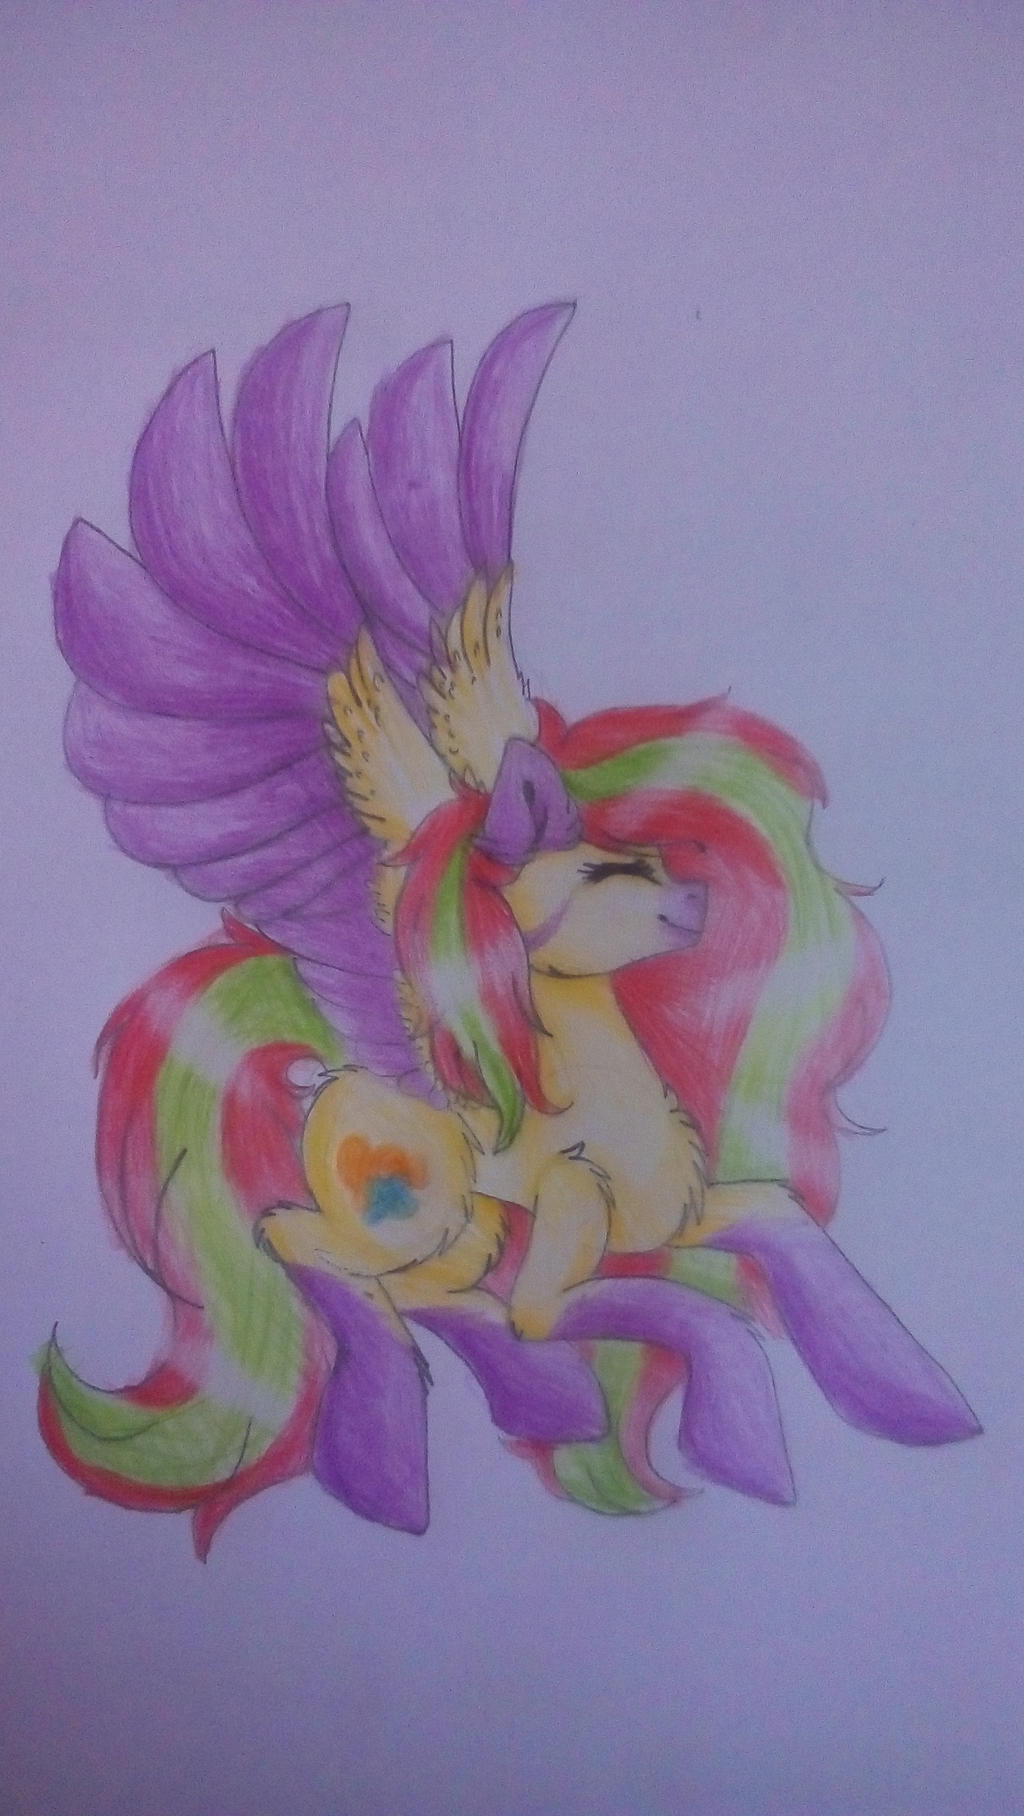 [MLP Fan Art] Millotta Paint by Cappuccinno